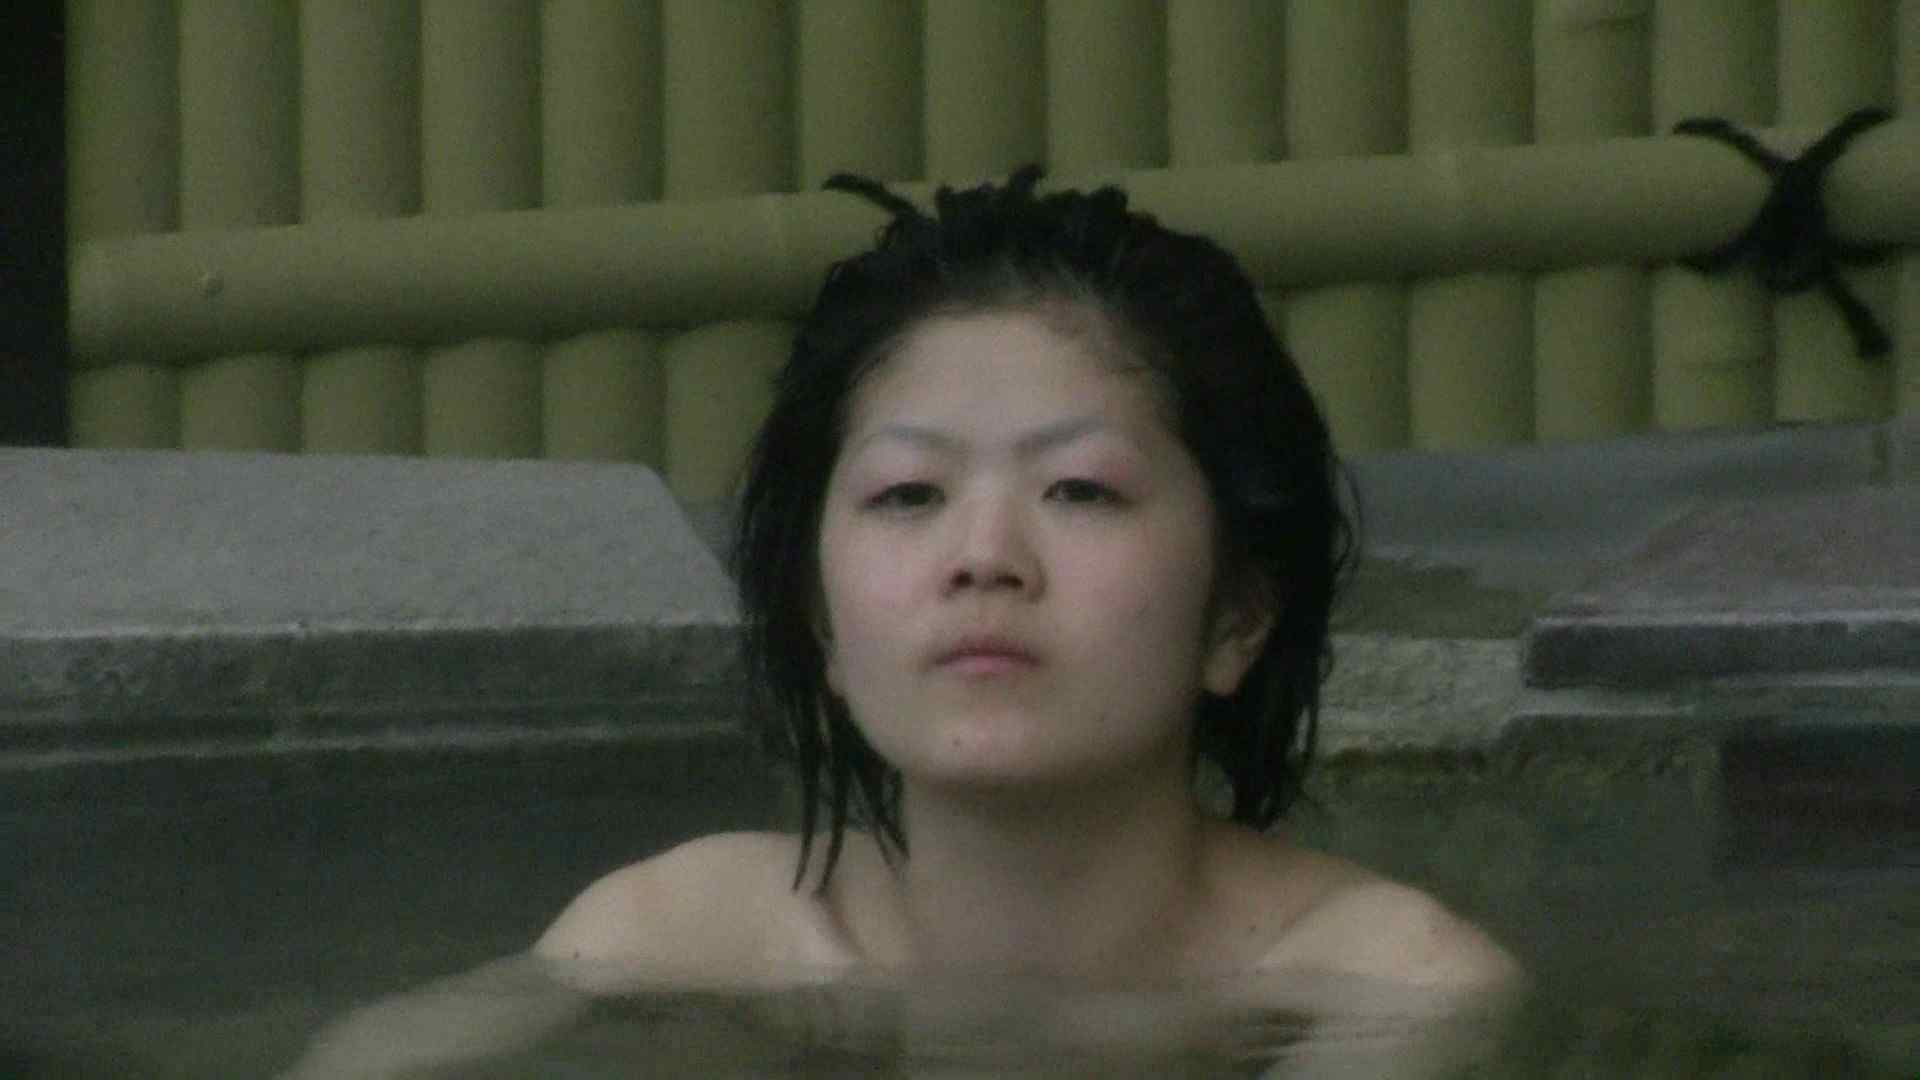 Aquaな露天風呂Vol.538 盗撮師作品 おめこ無修正動画無料 82pic 41